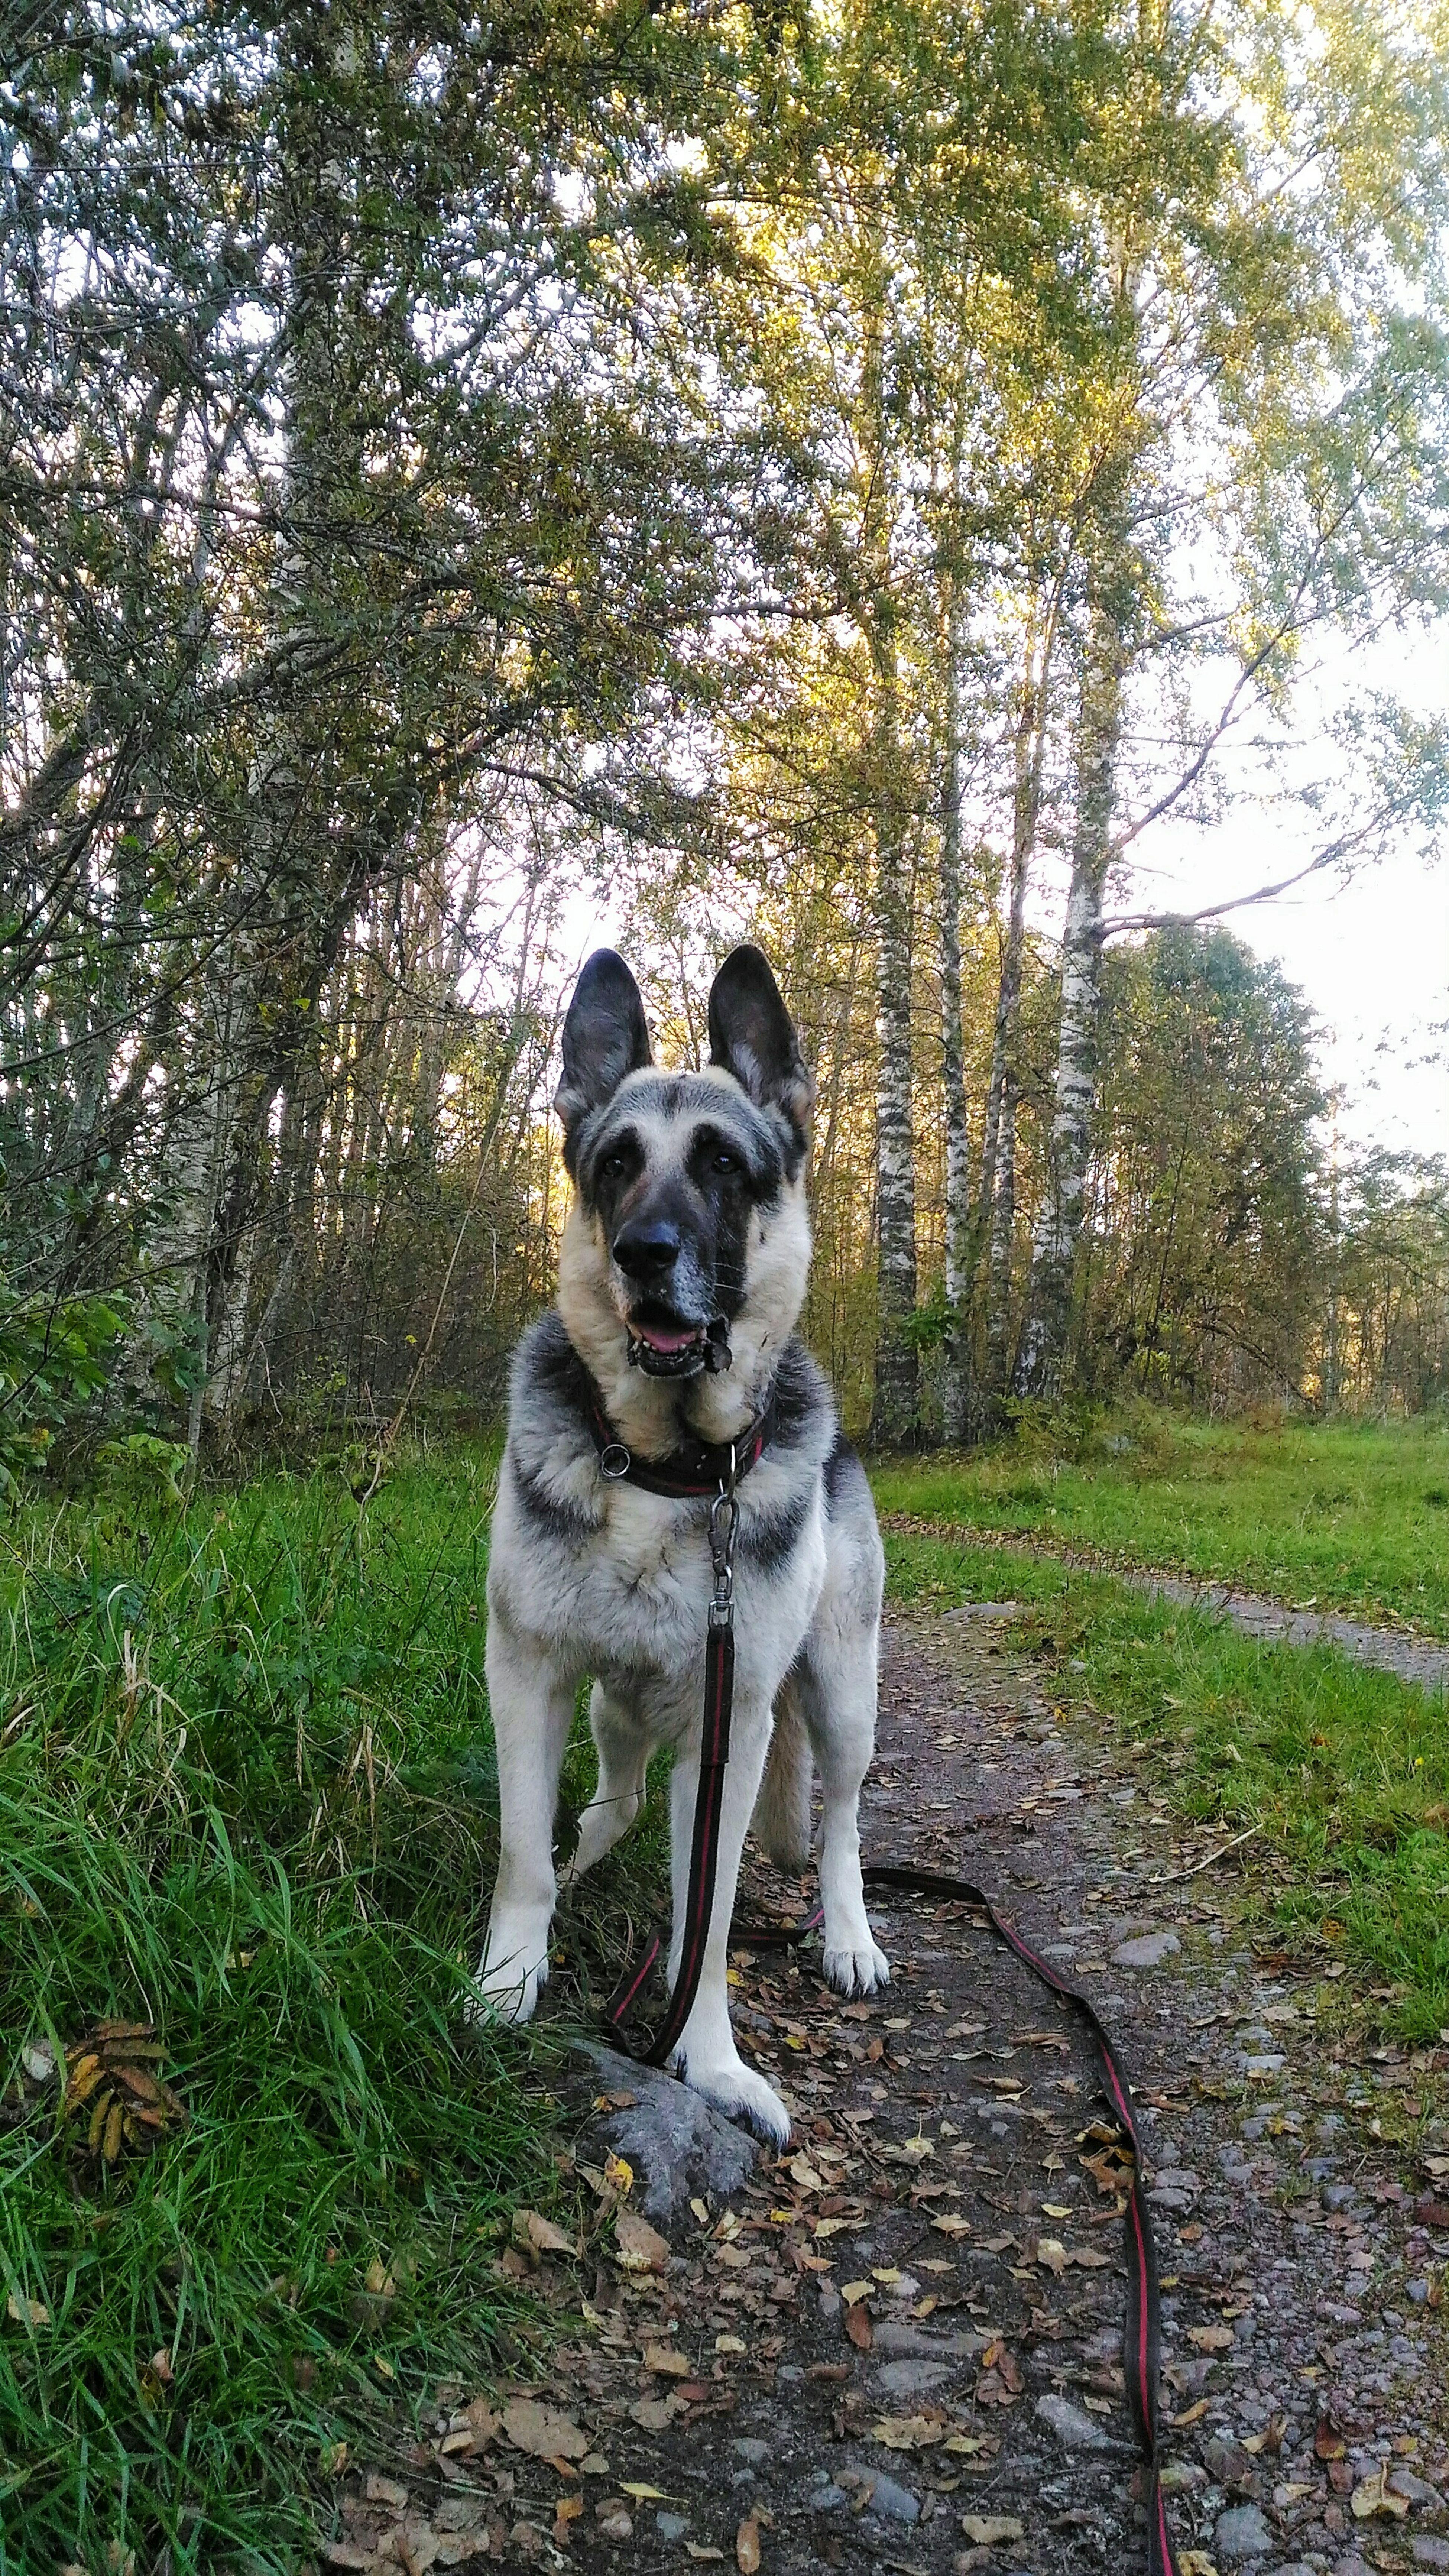 Dog Animal Themes Pets One Animal Looking At Camera No People Shepherd EastEuropeanShepherd Shepherddog HomePet